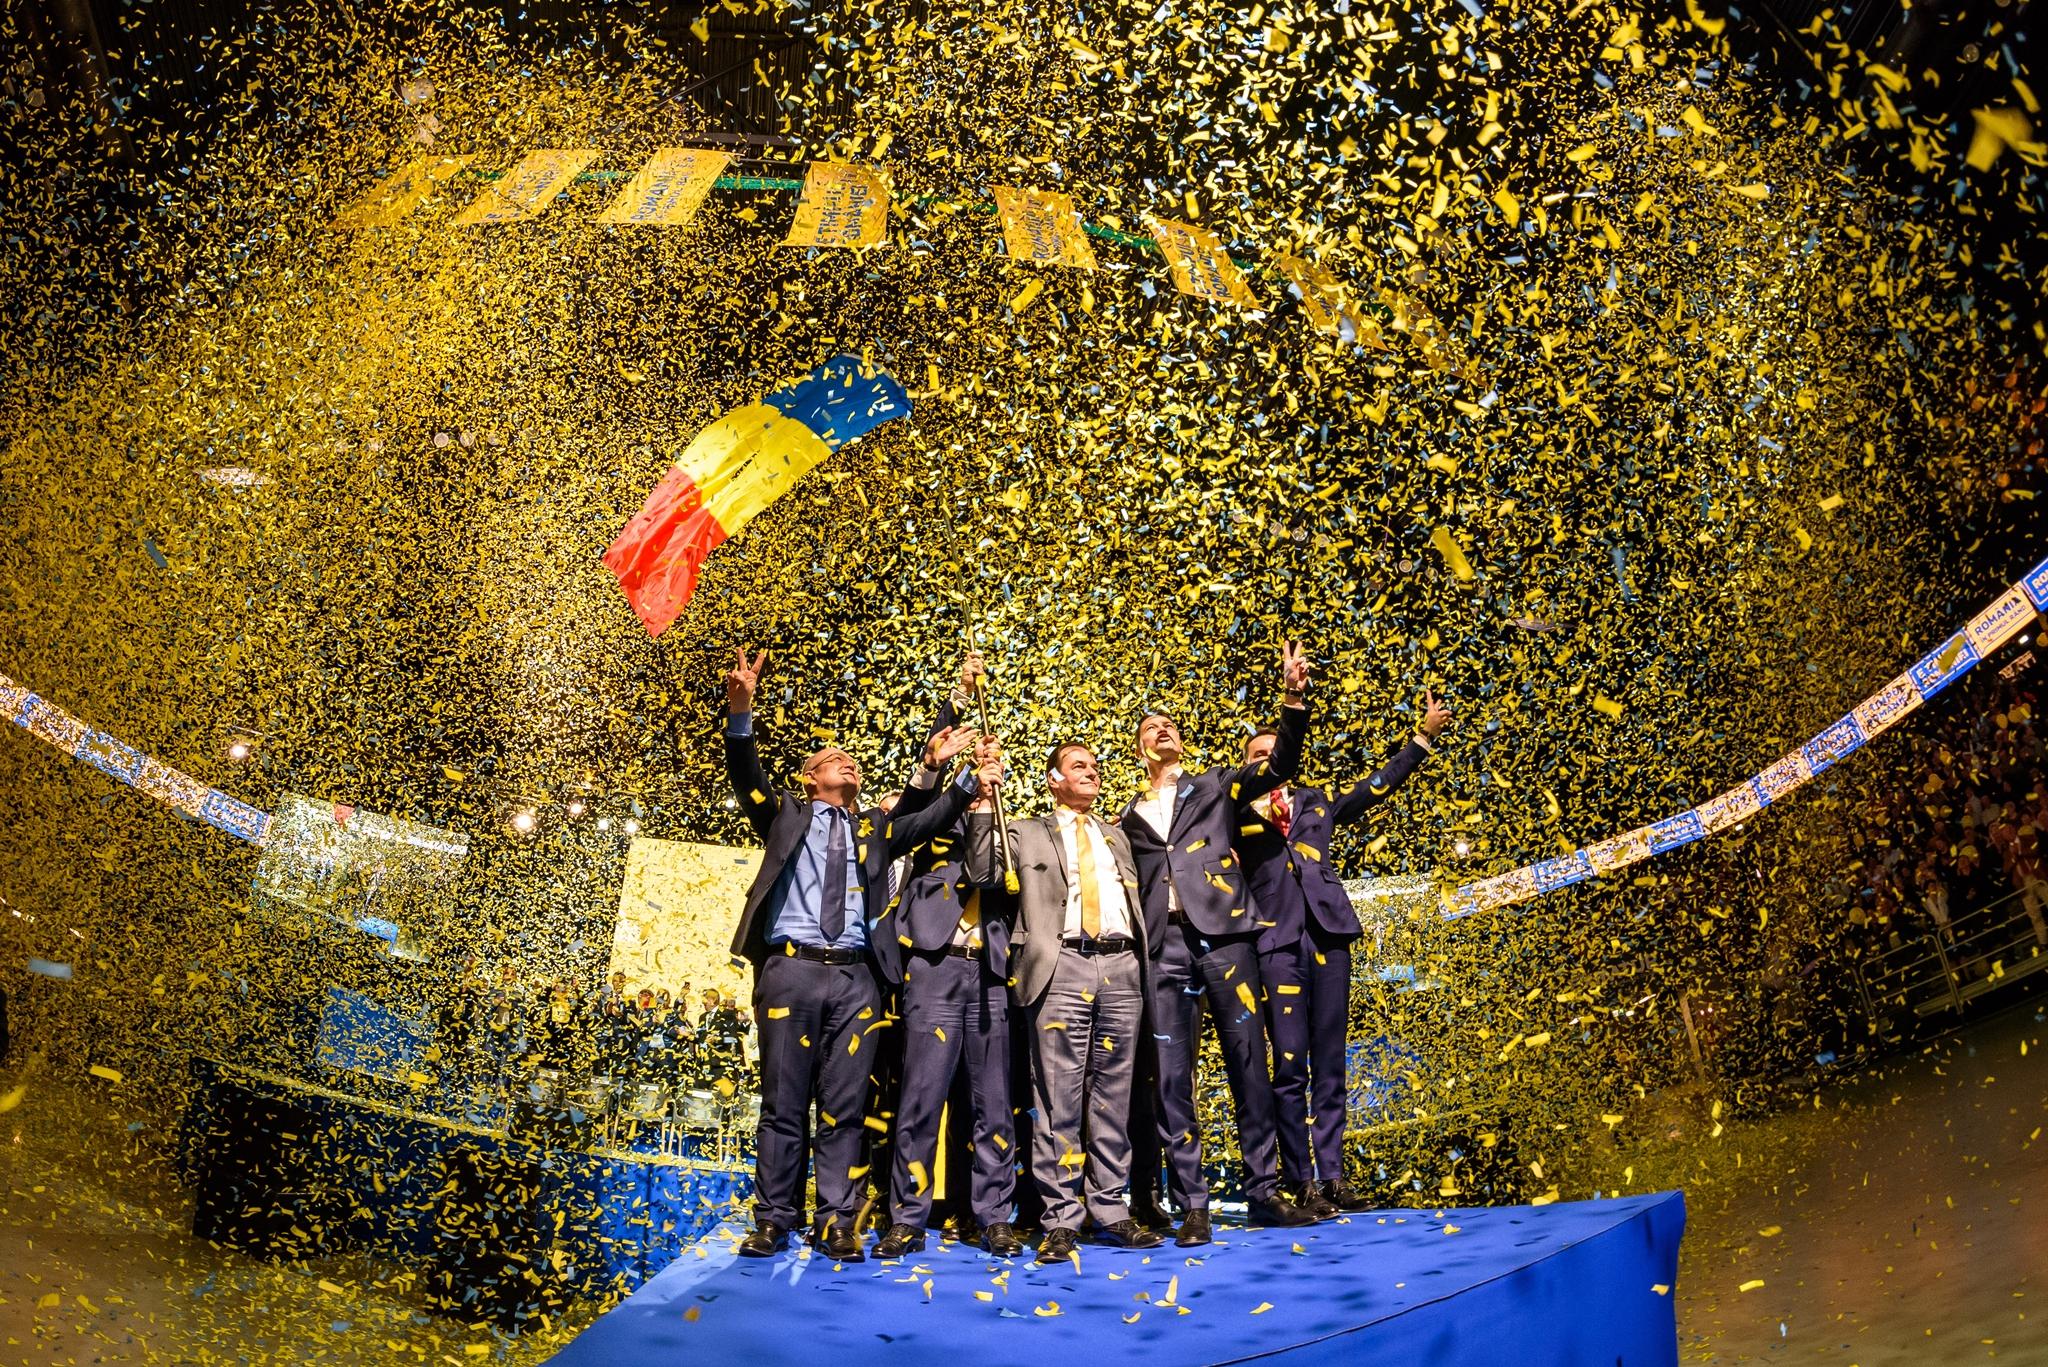 223 - Lans. Candidatilor Euro PNL - Cluj 31.03.2019 - RP1_7552